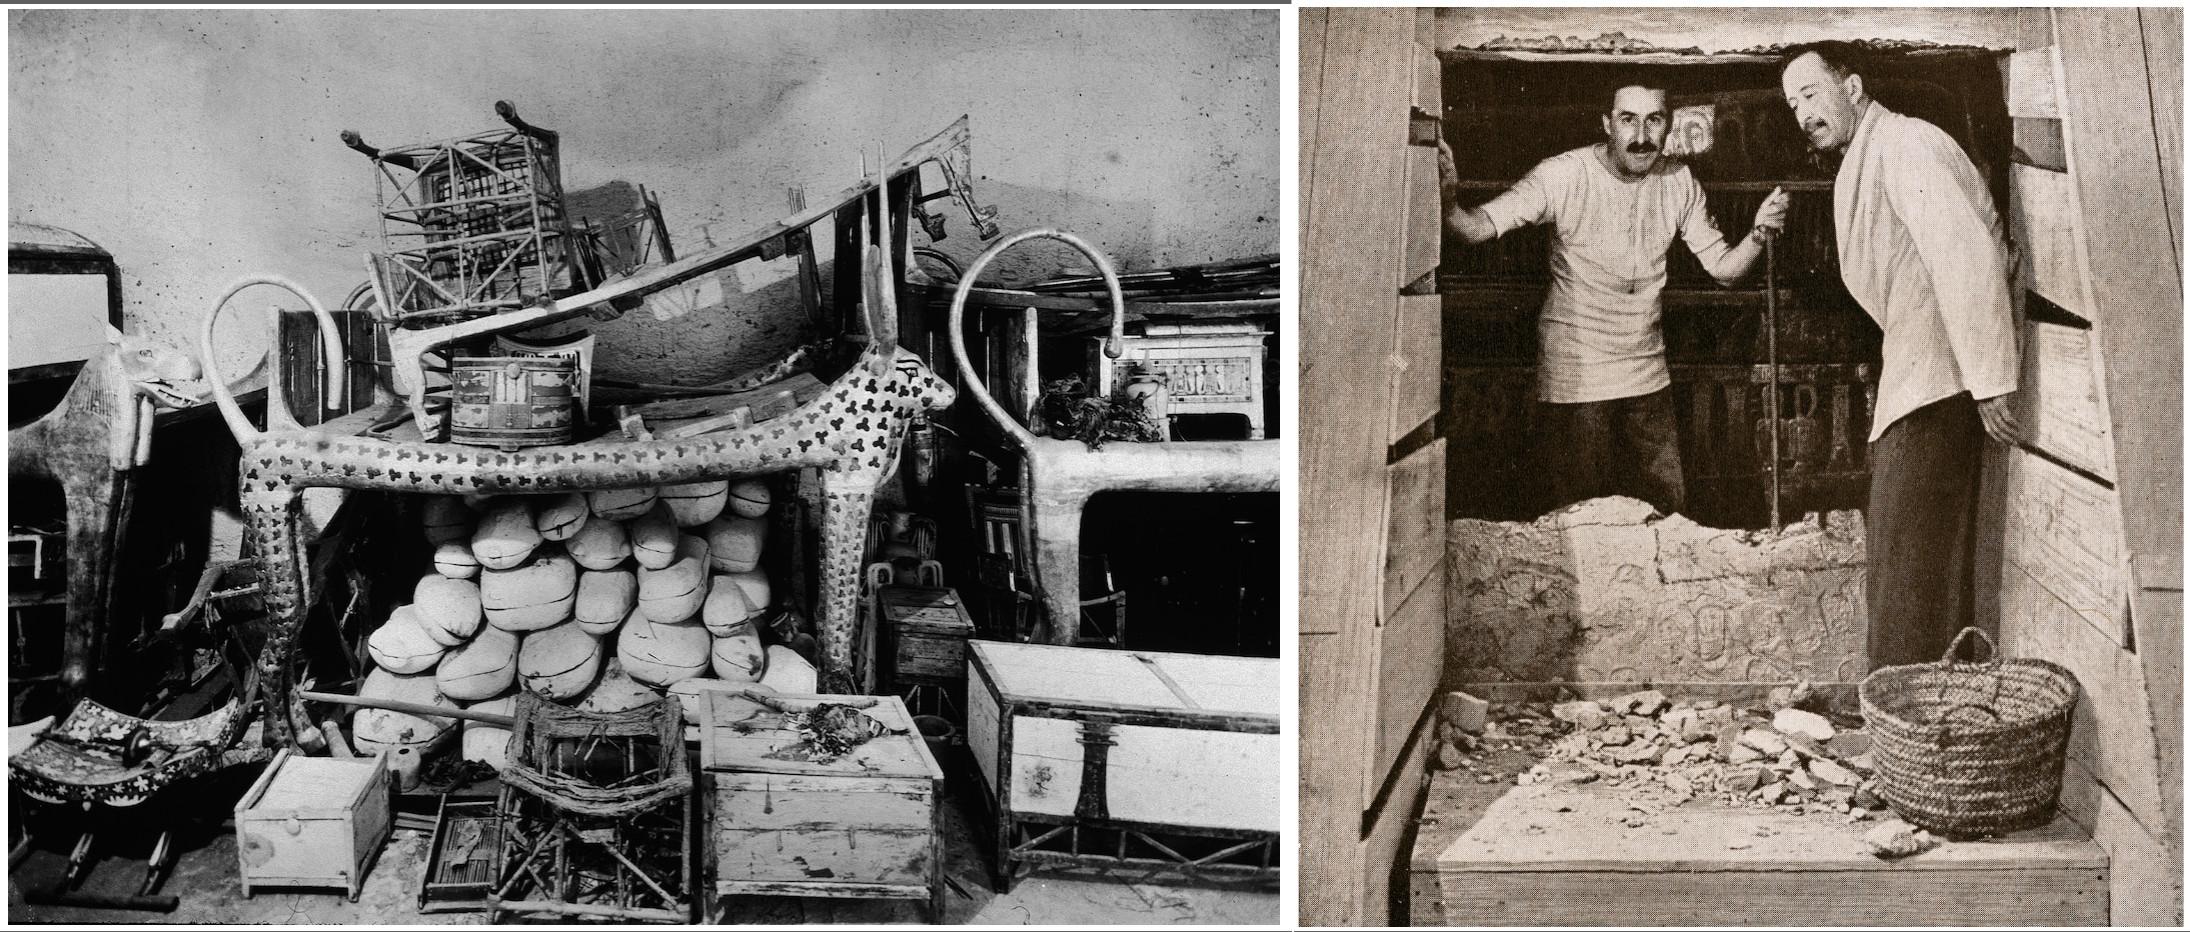 howard carter 1922 tut ankh tomb